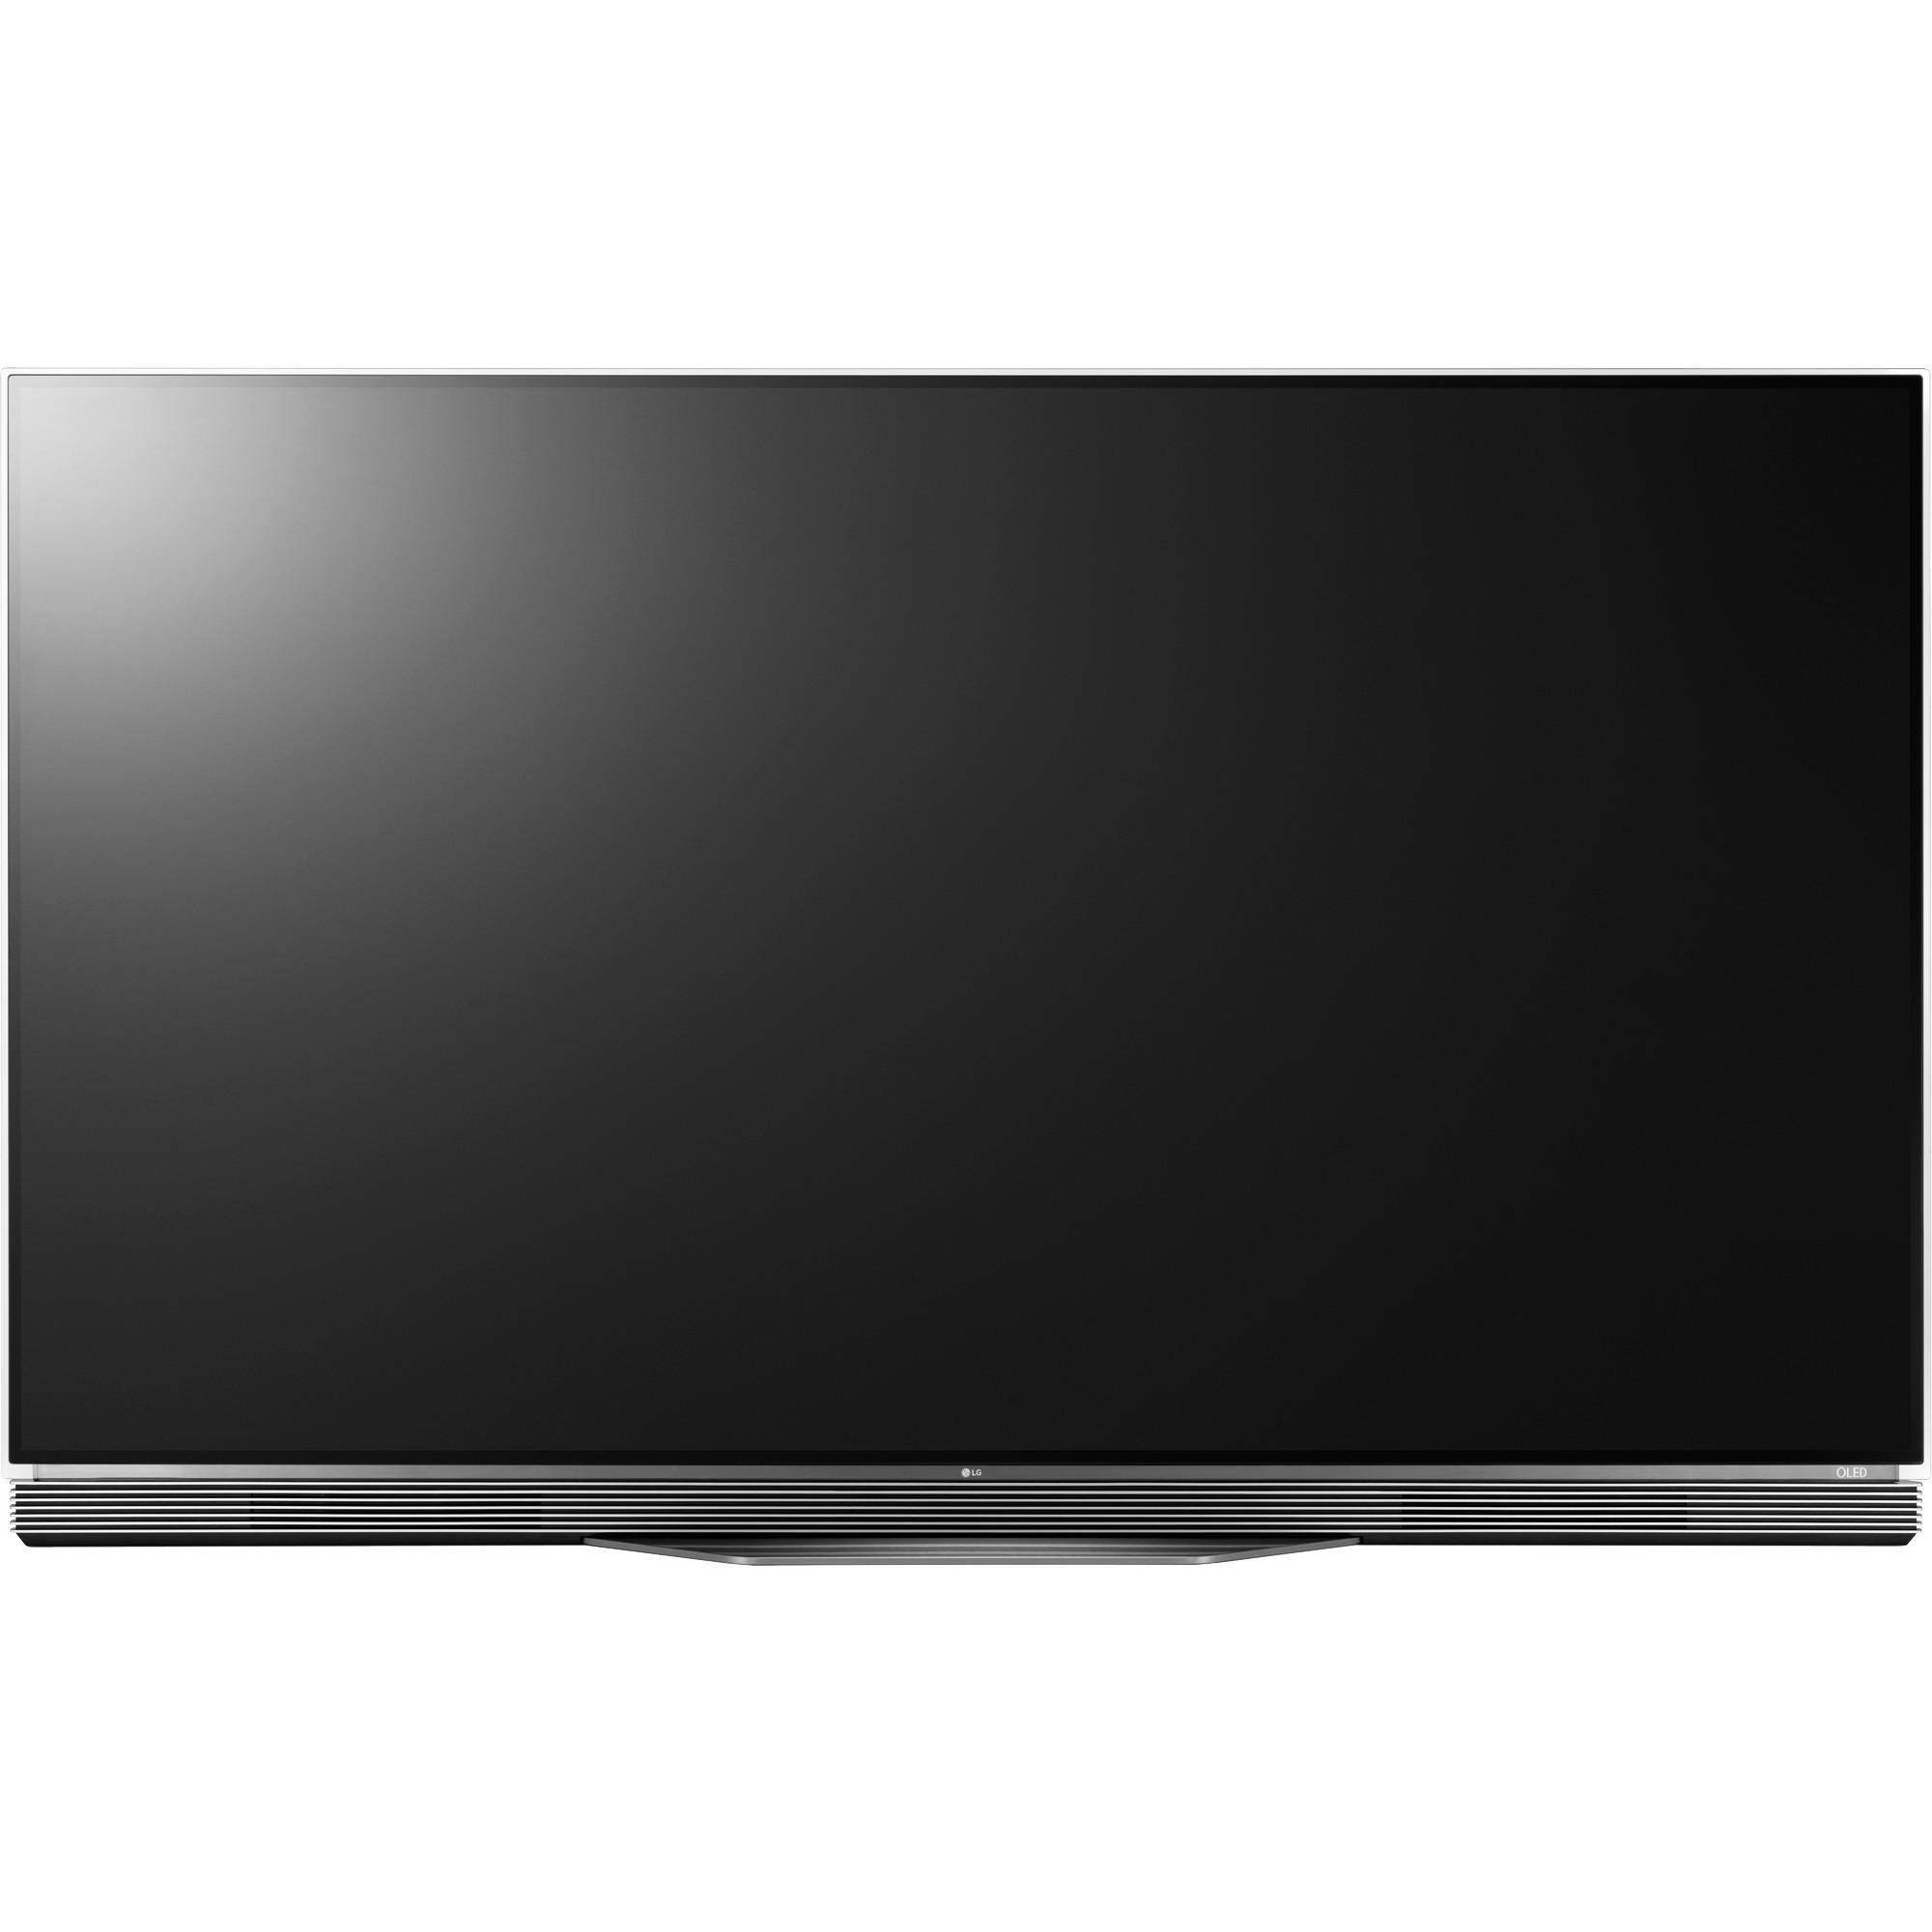 OLED55E6D, OLED-TV